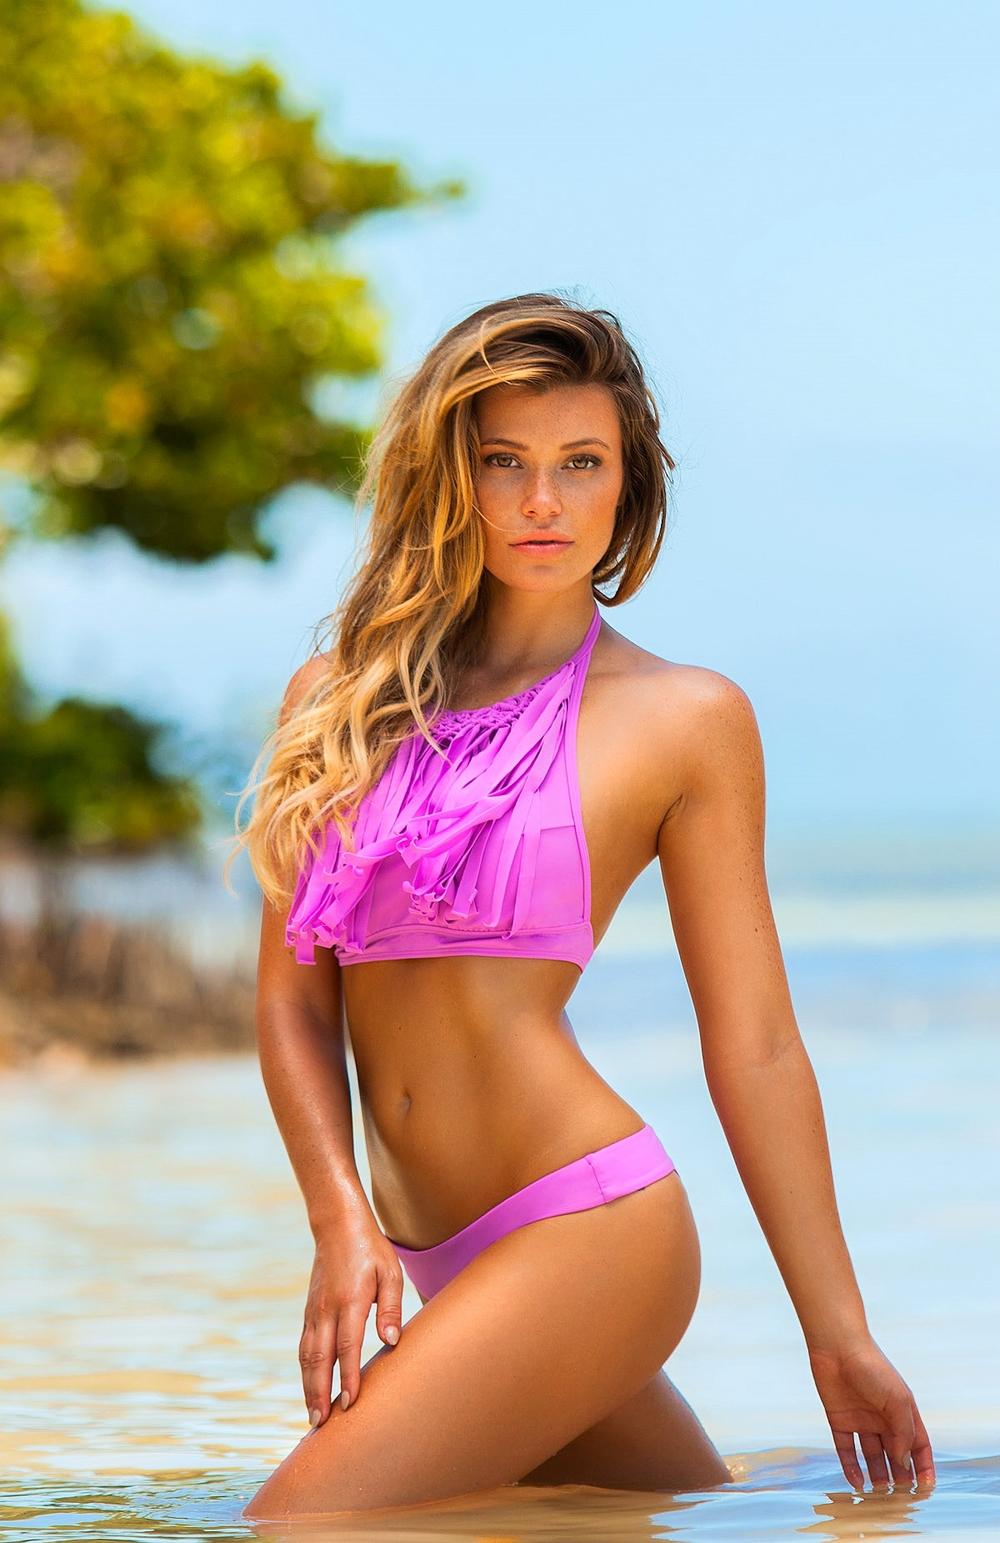 Maldives Bikini